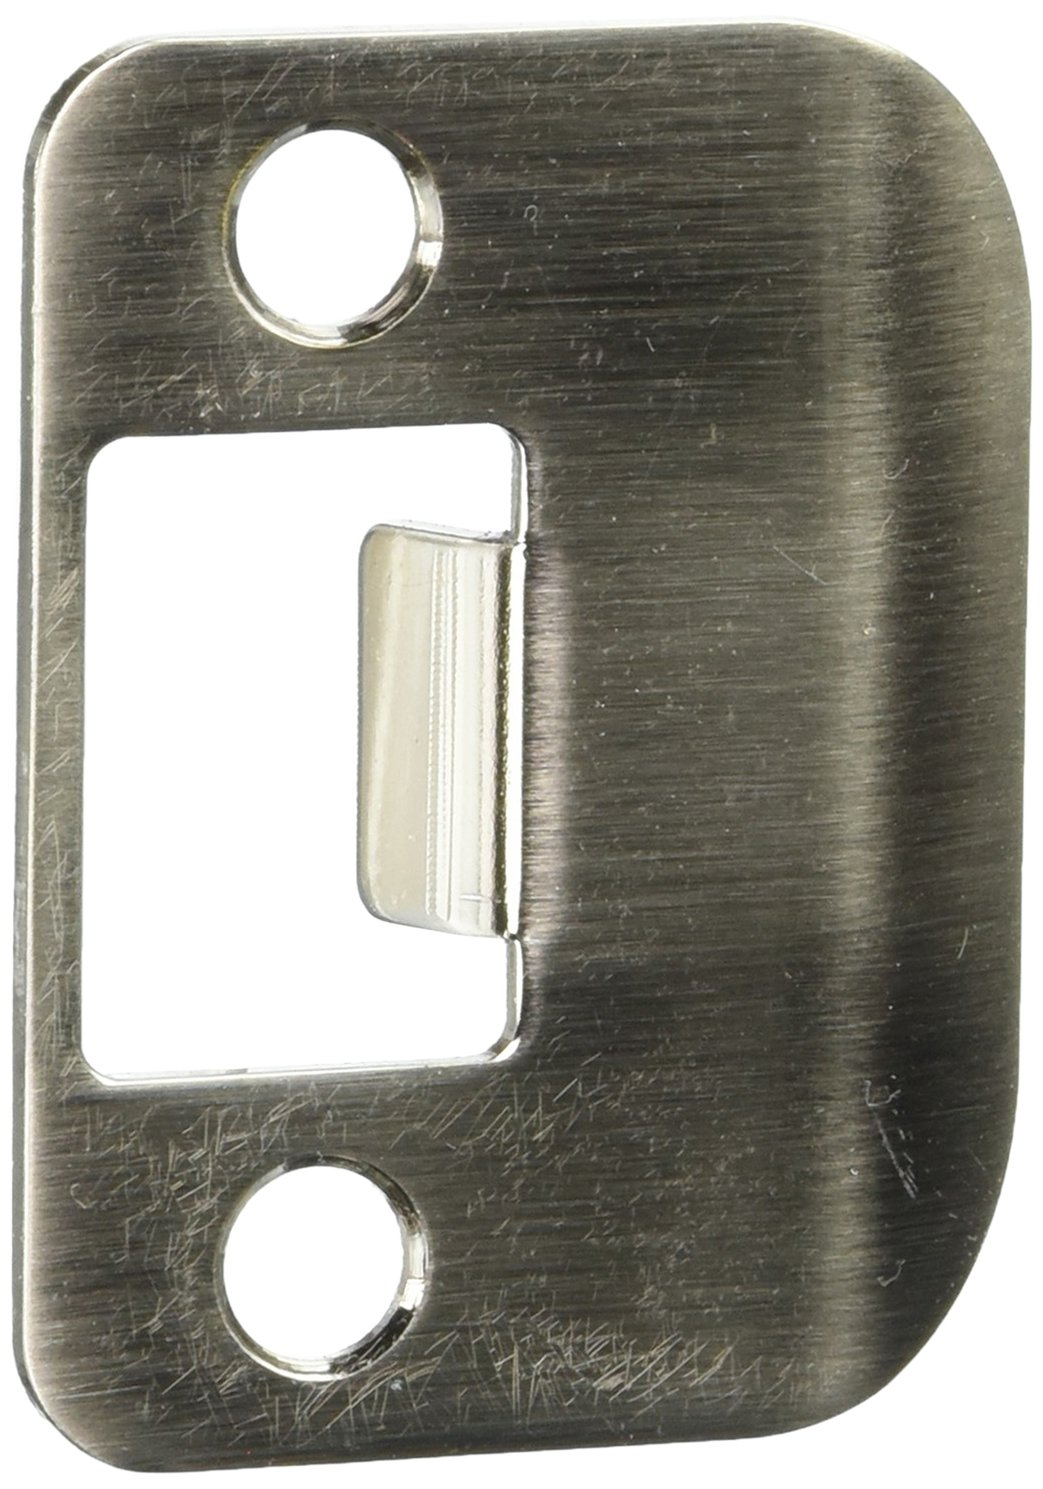 Don-Jo ST 214 RC 18 Gauge Steel Replacement Strike with Radius Corner, Blackened Satin Nickel Plated, 1-1/4